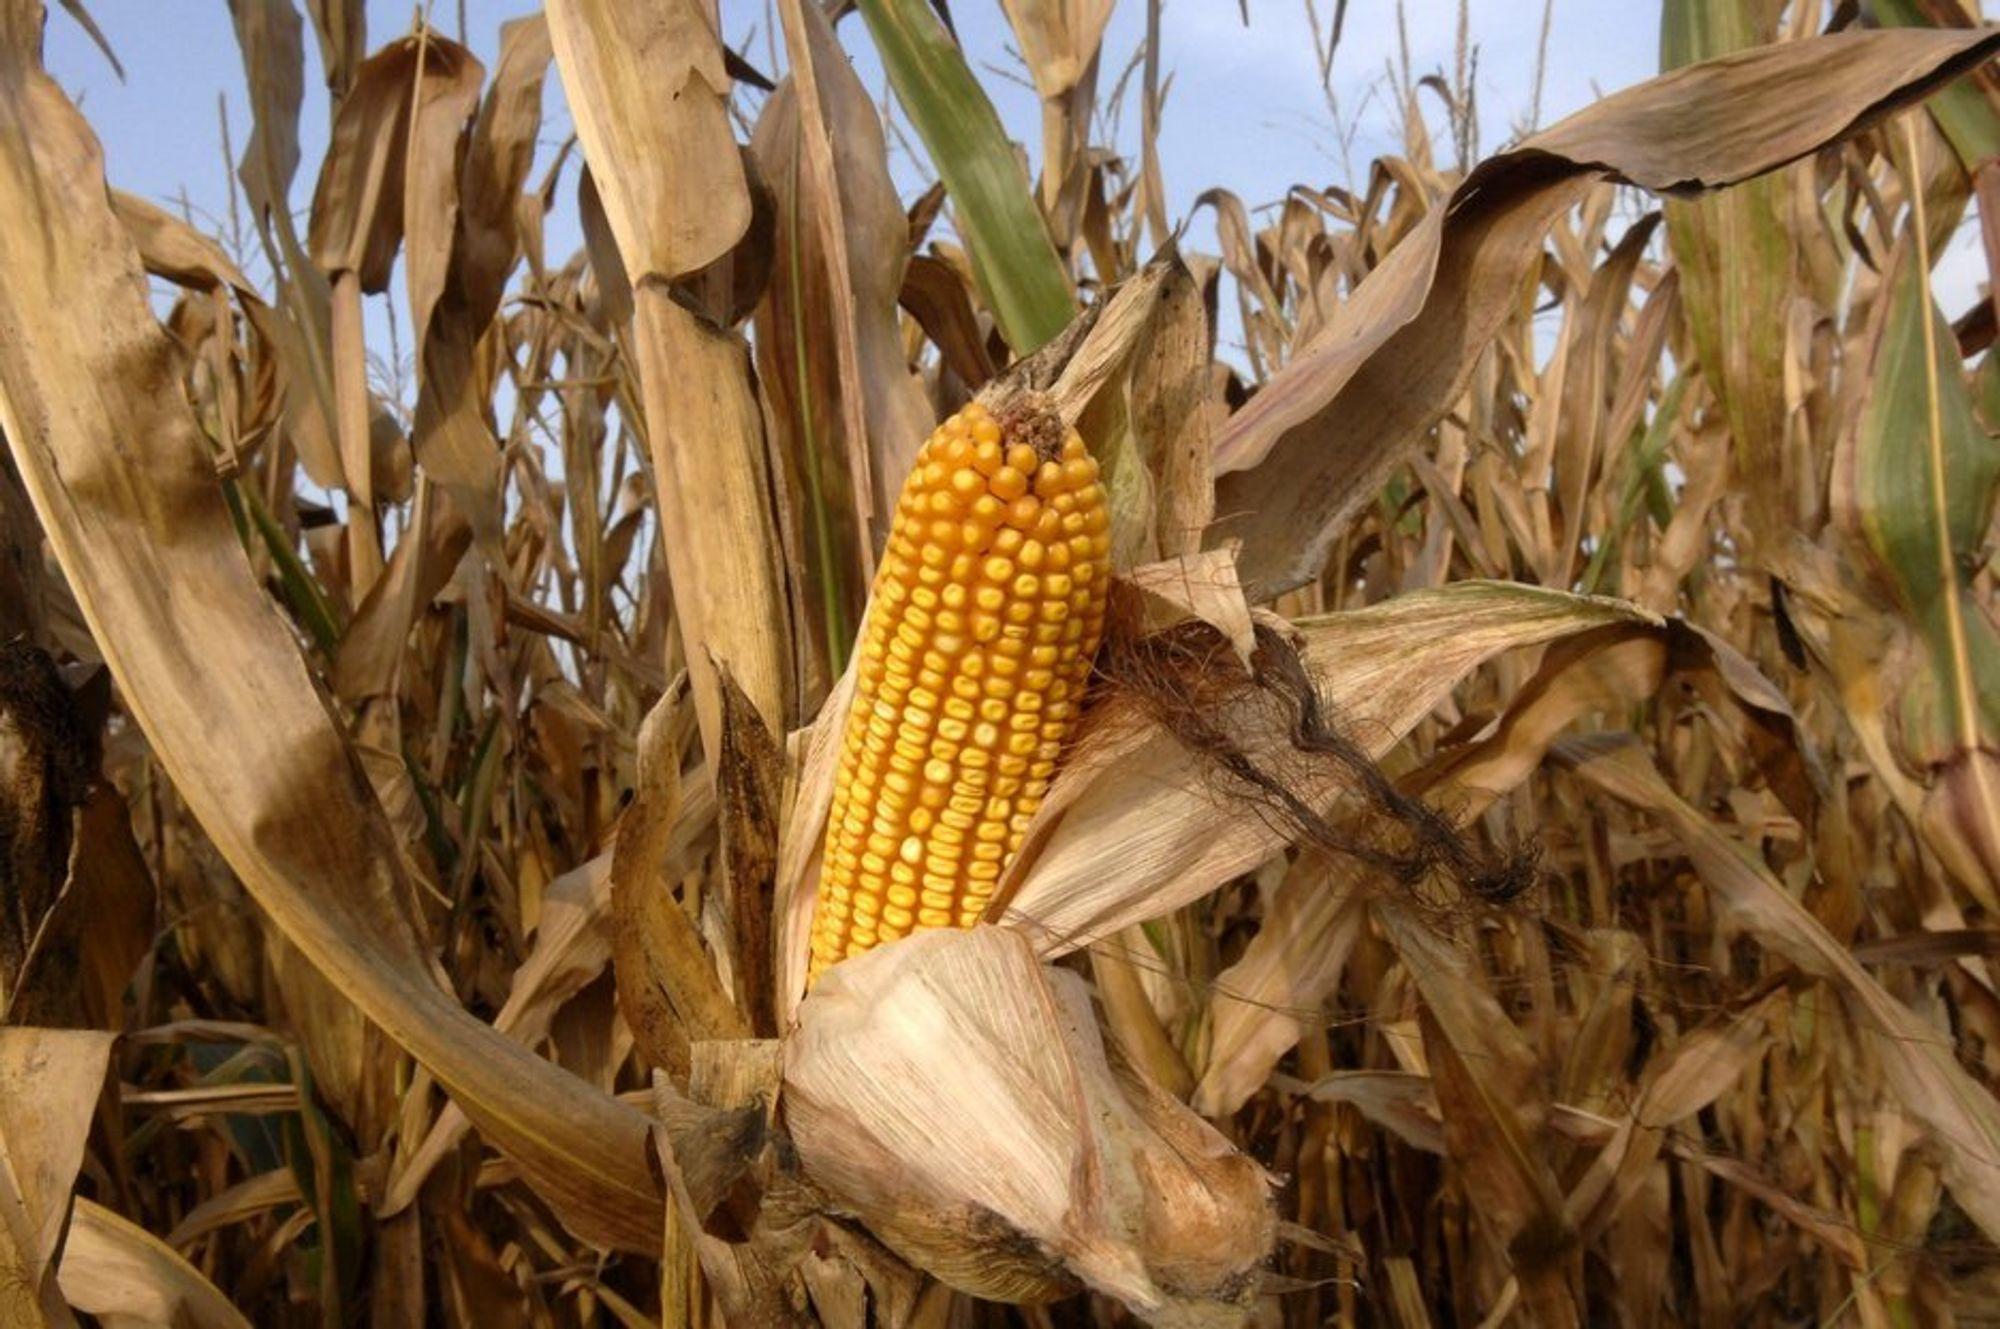 Bioetanol fra mais kan være langt bedre enn tidligere antatt, ifølge en ny rapport fra forskere ved Yale University.